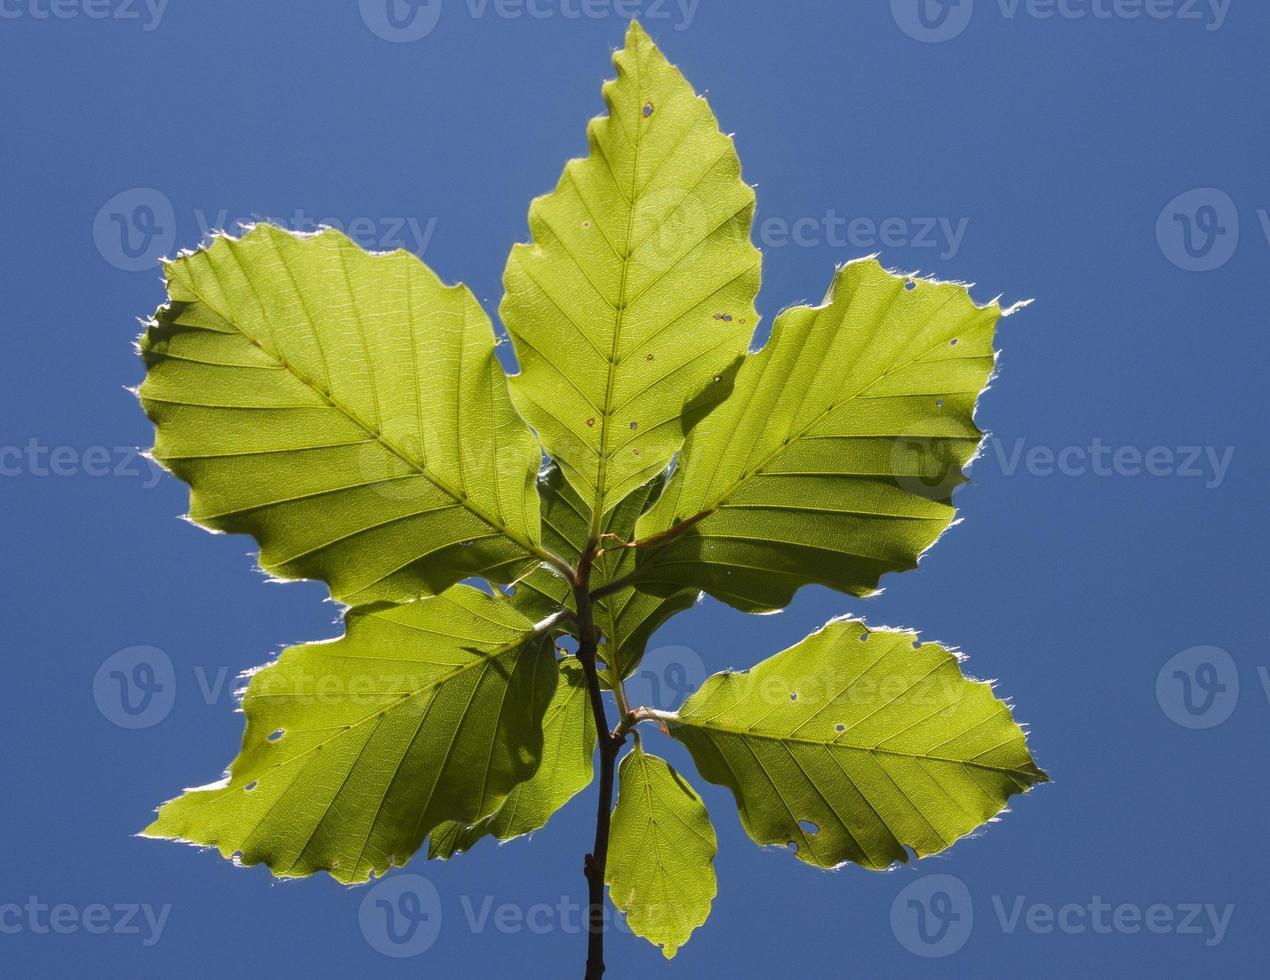 Beech leaves on stick photo